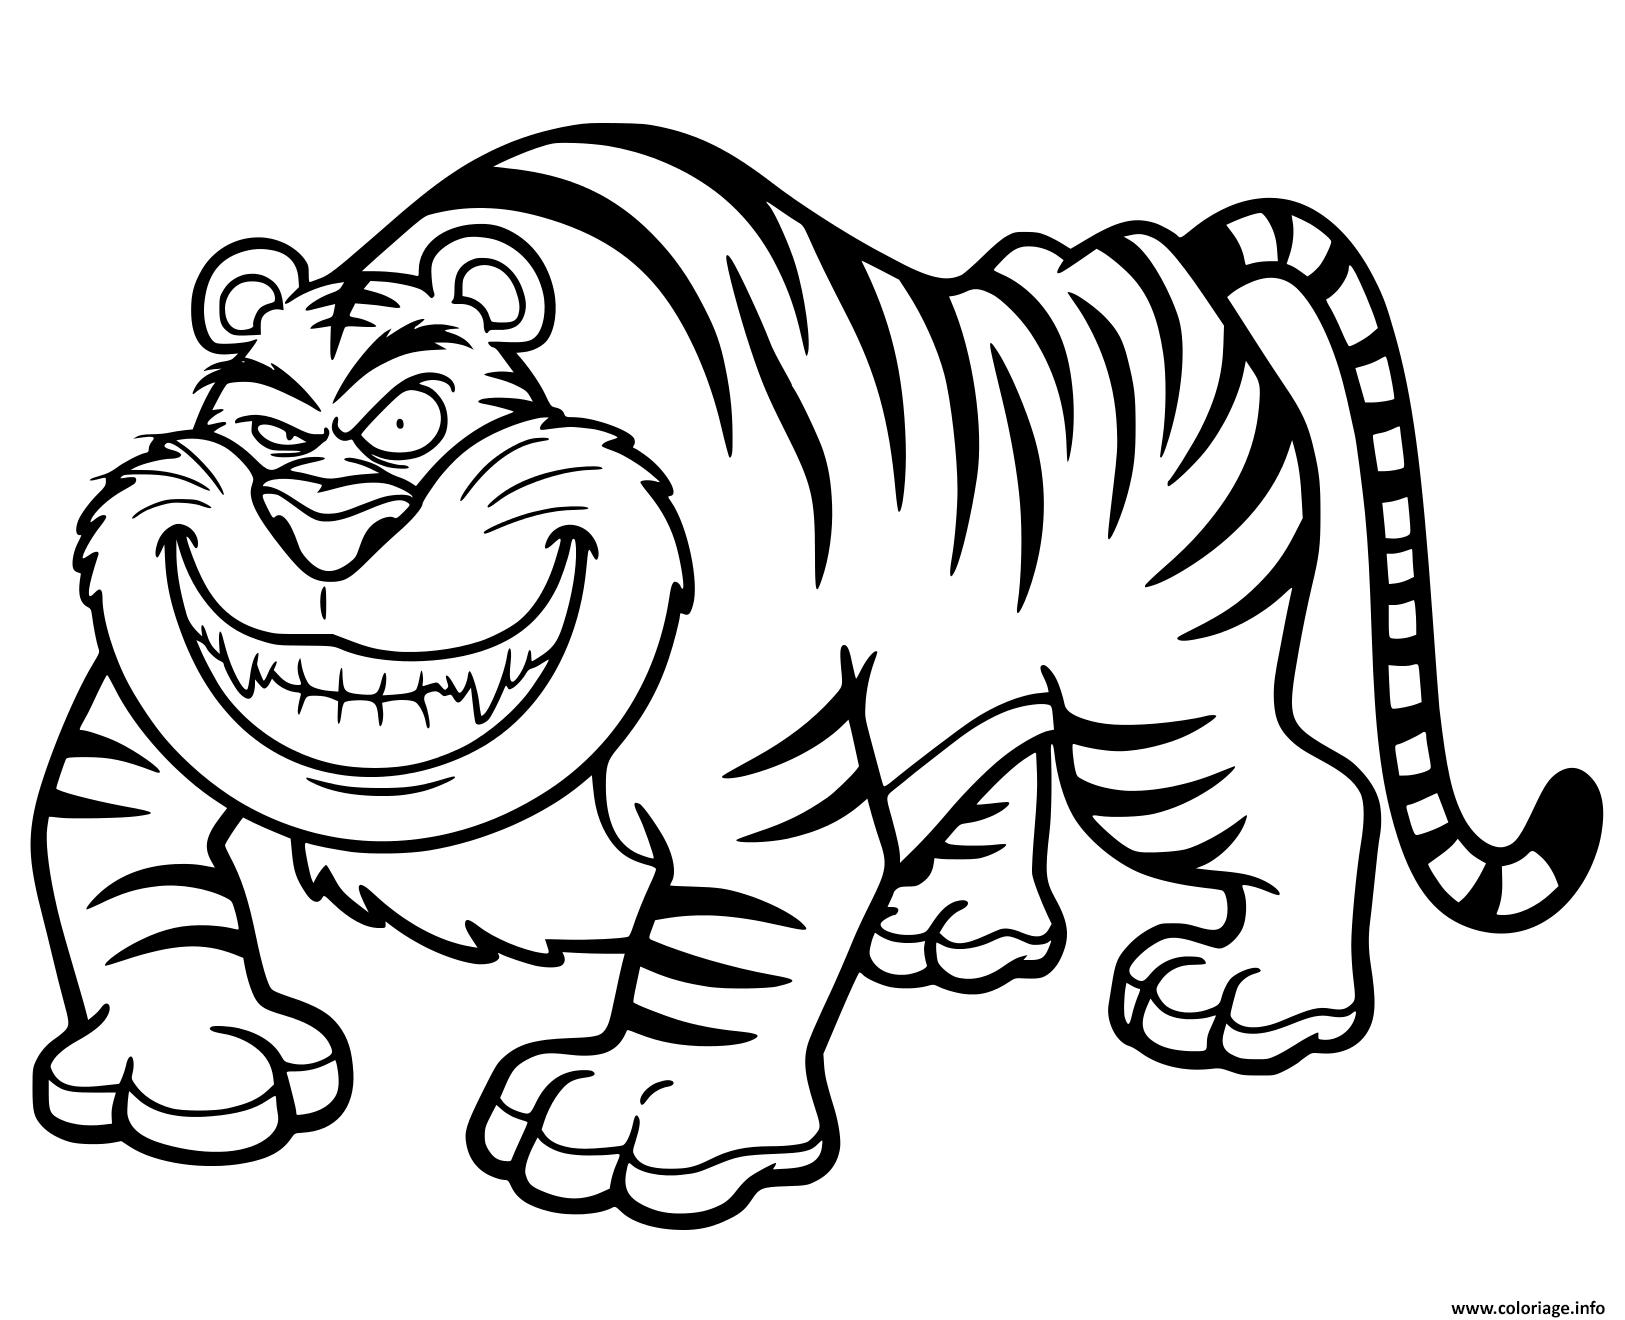 Dessin tigre cartoon amusant Coloriage Gratuit à Imprimer